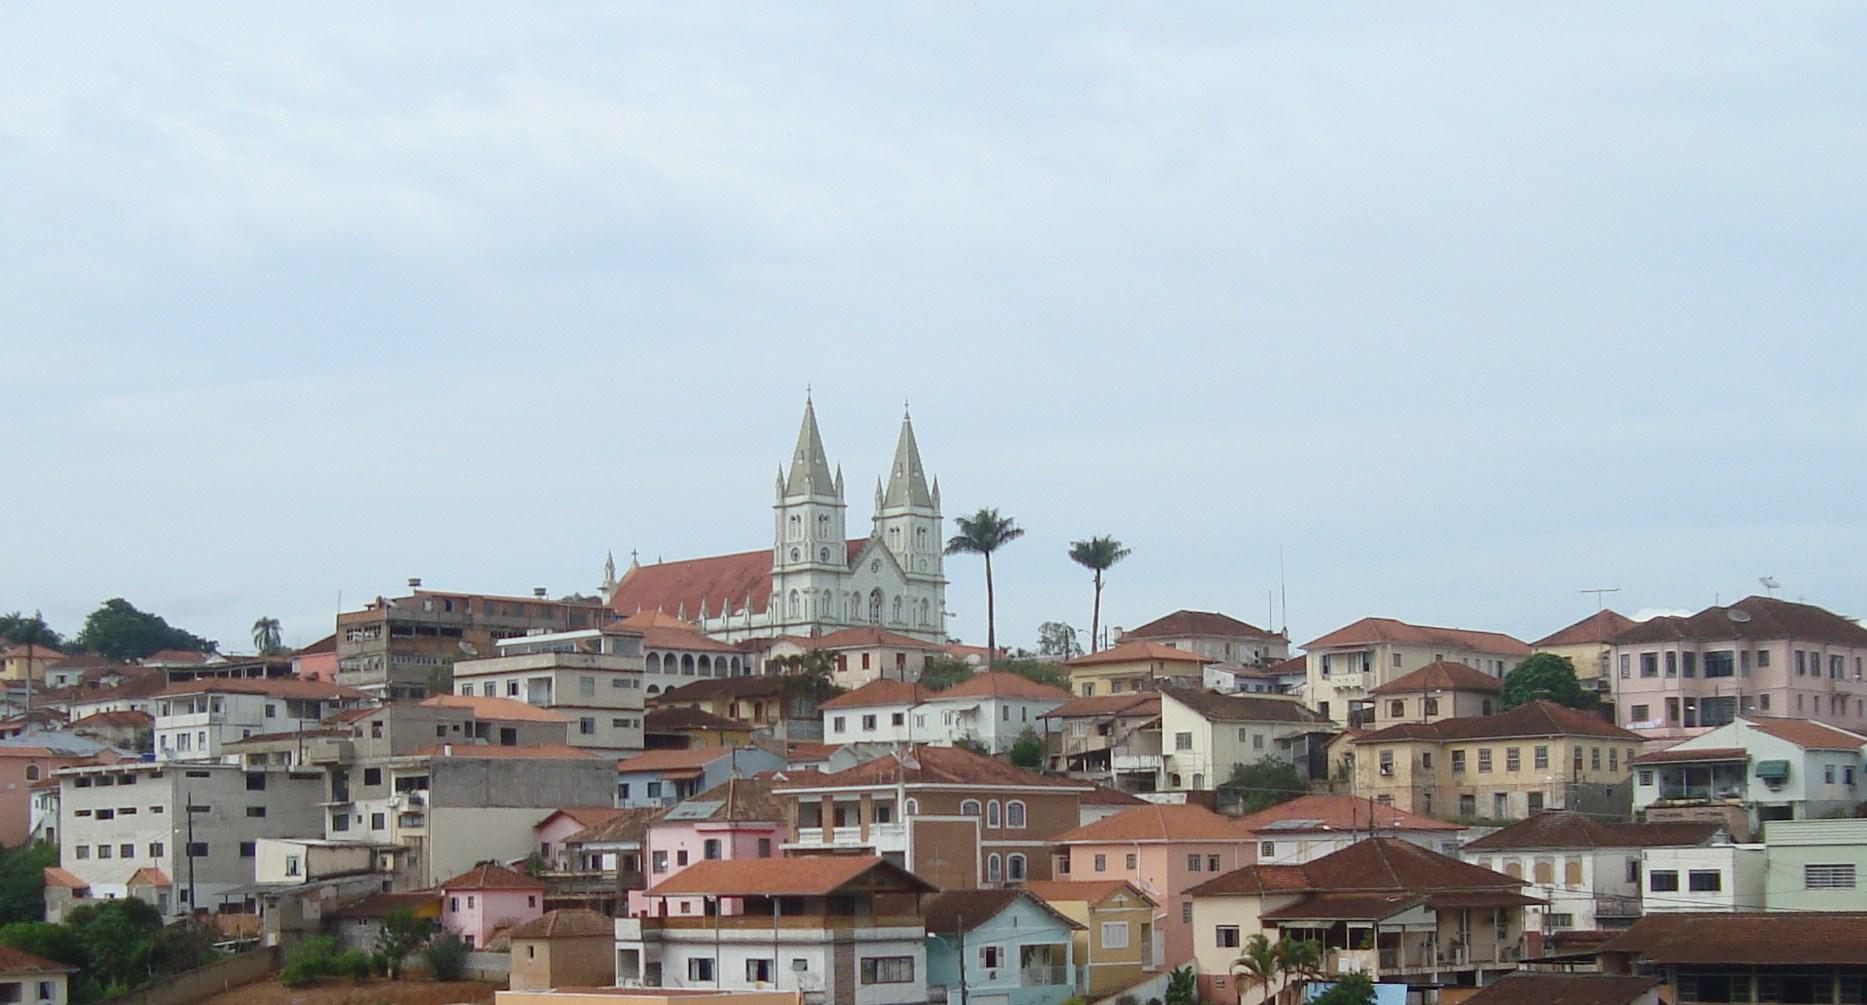 Brazópolis Minas Gerais fonte: upload.wikimedia.org